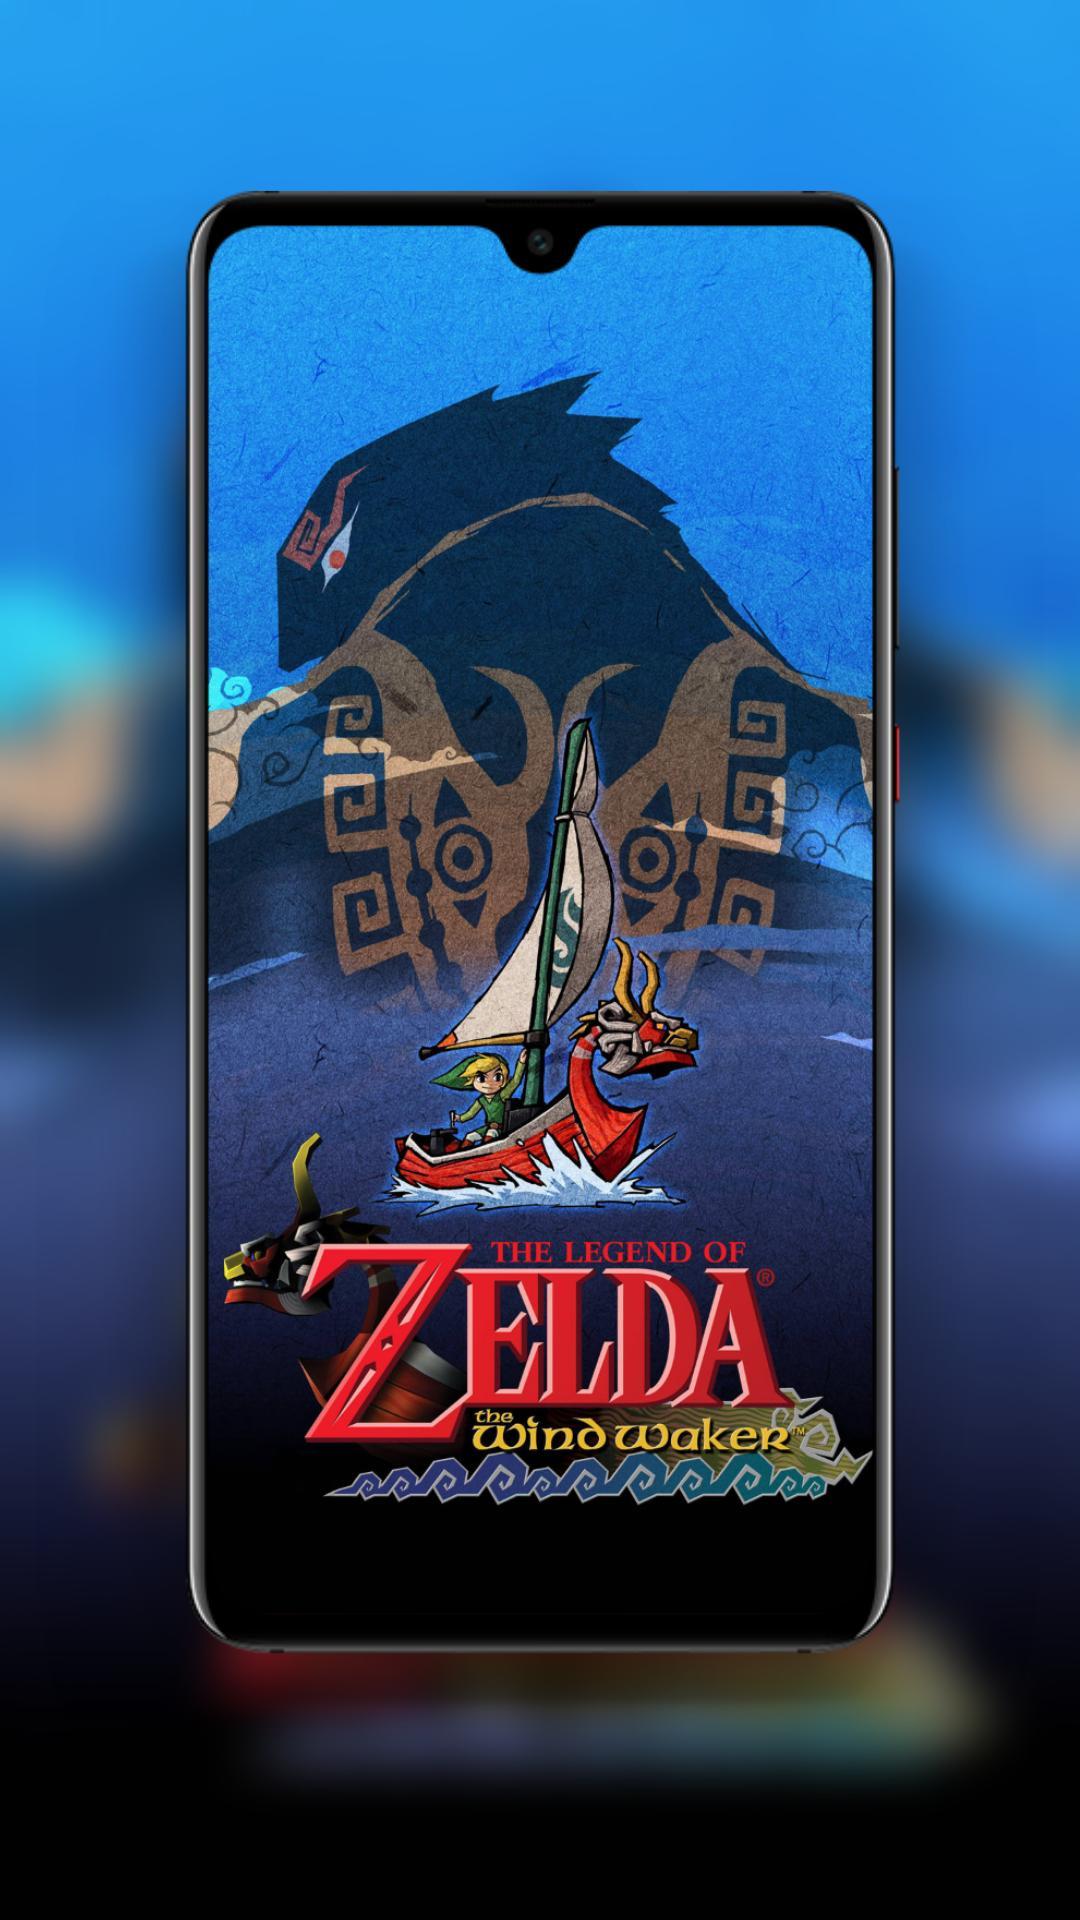 Legends Of Zelda Wallpaper For Android Apk Download